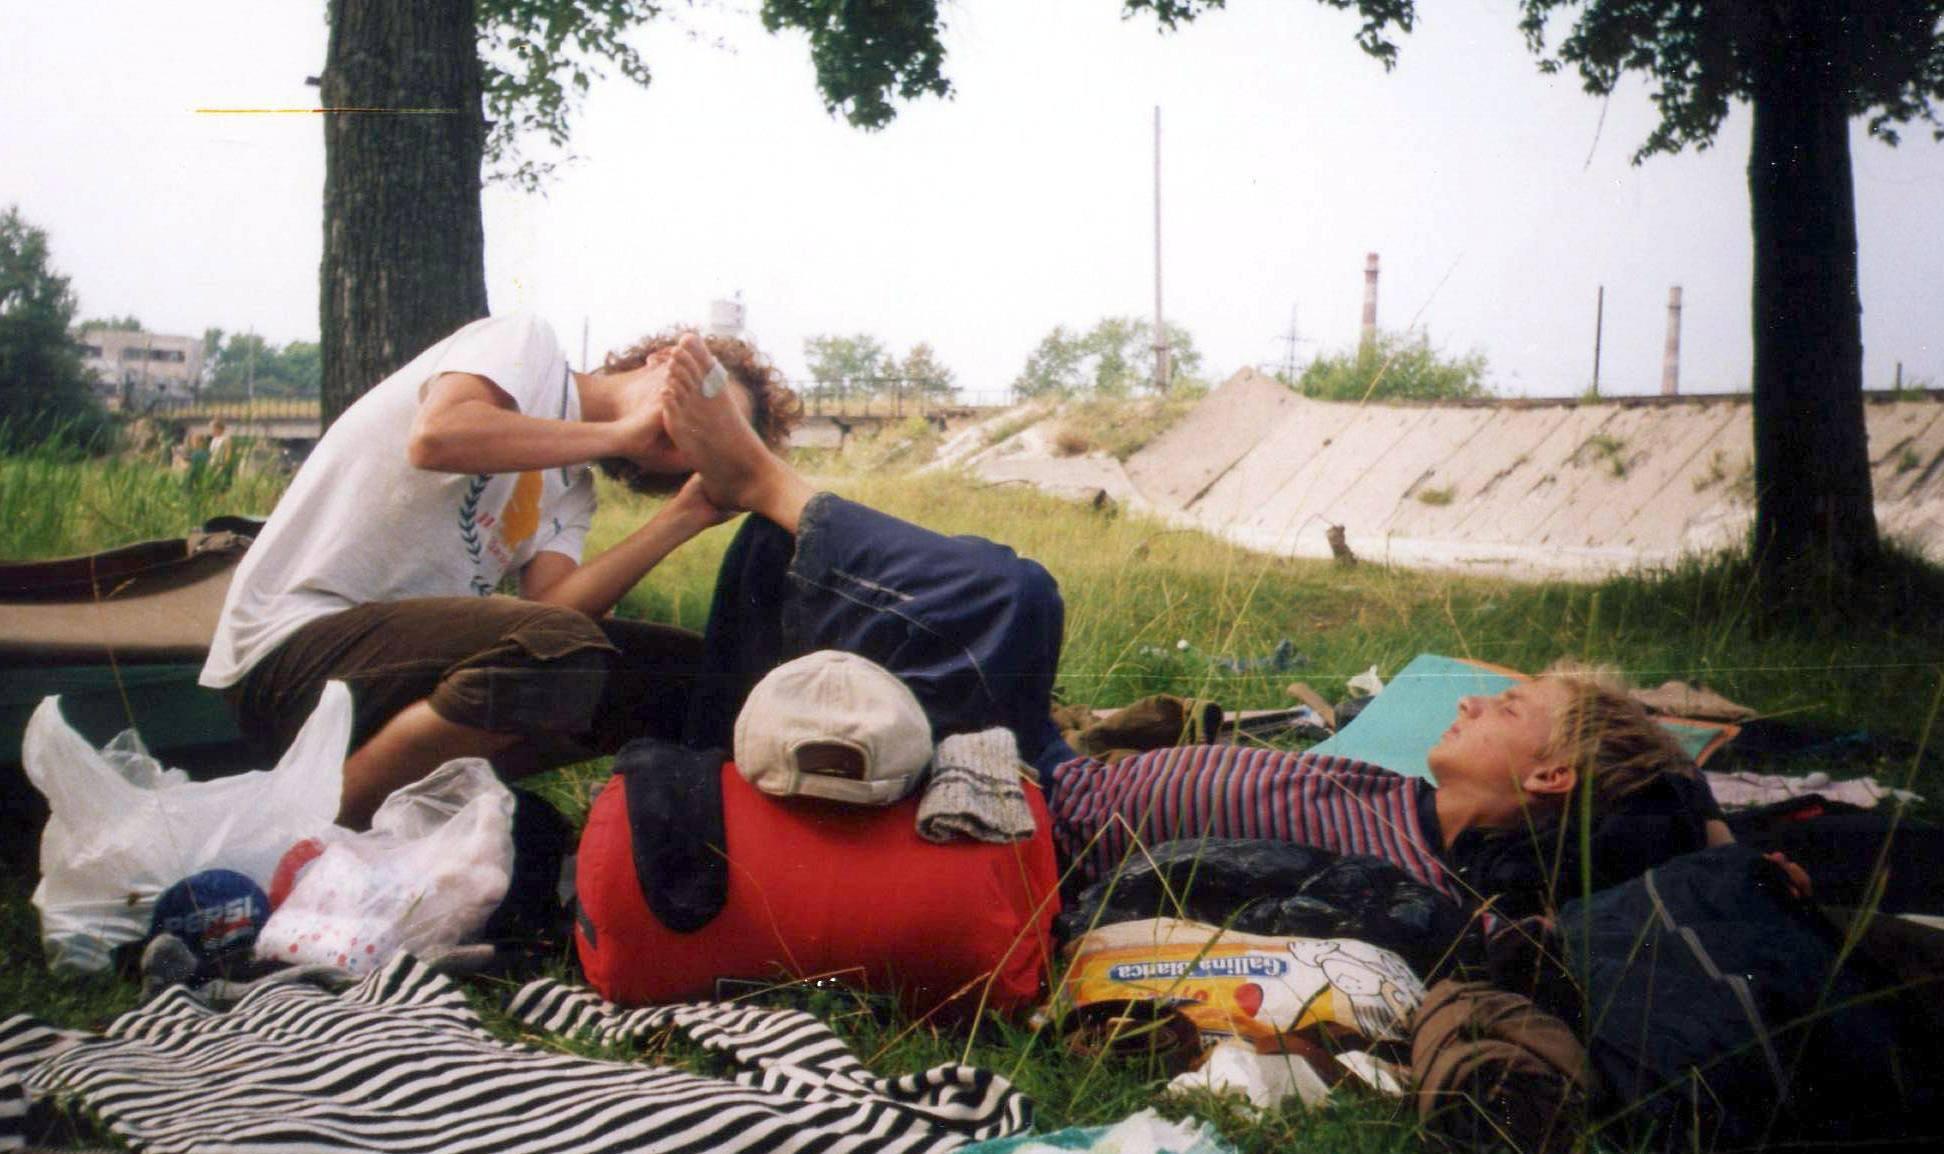 три девушки голые сидят и поют про камаров на траве видео